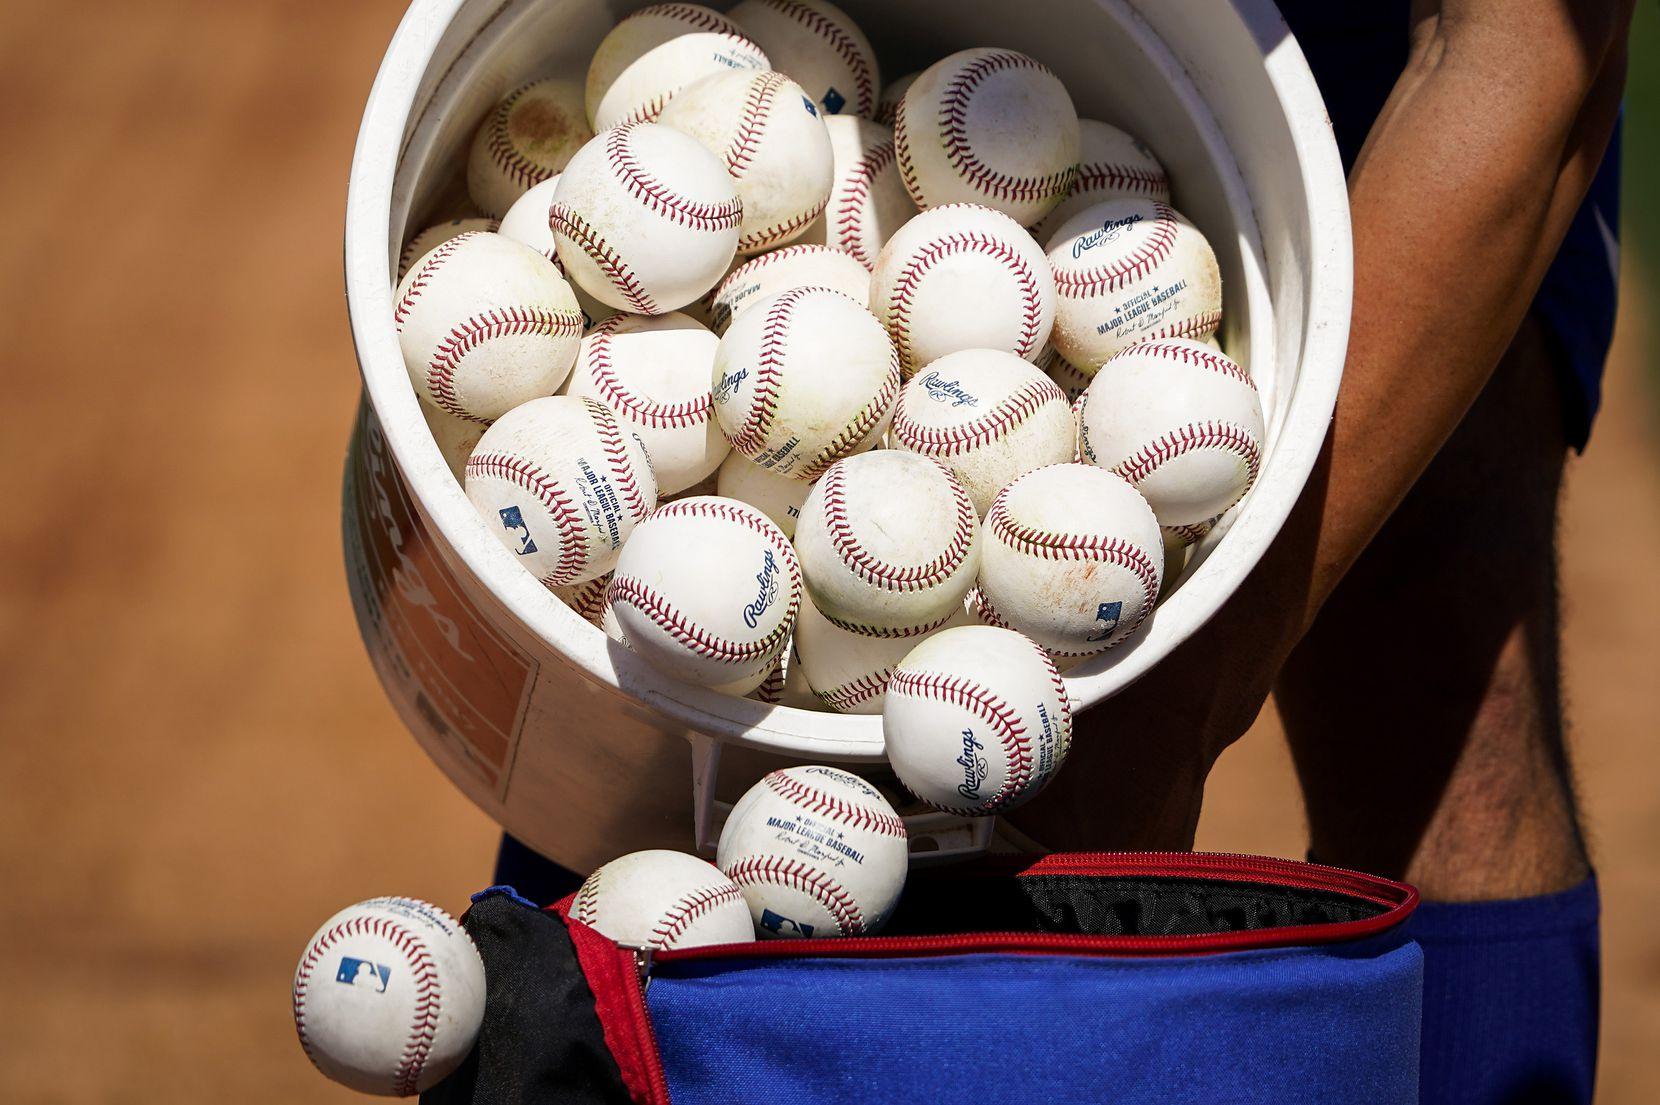 Rangers infielder Greg Bird dumped a bucket of baseballs from infield practice into a bag as spring training got underway in February in Surprise, Ariz.